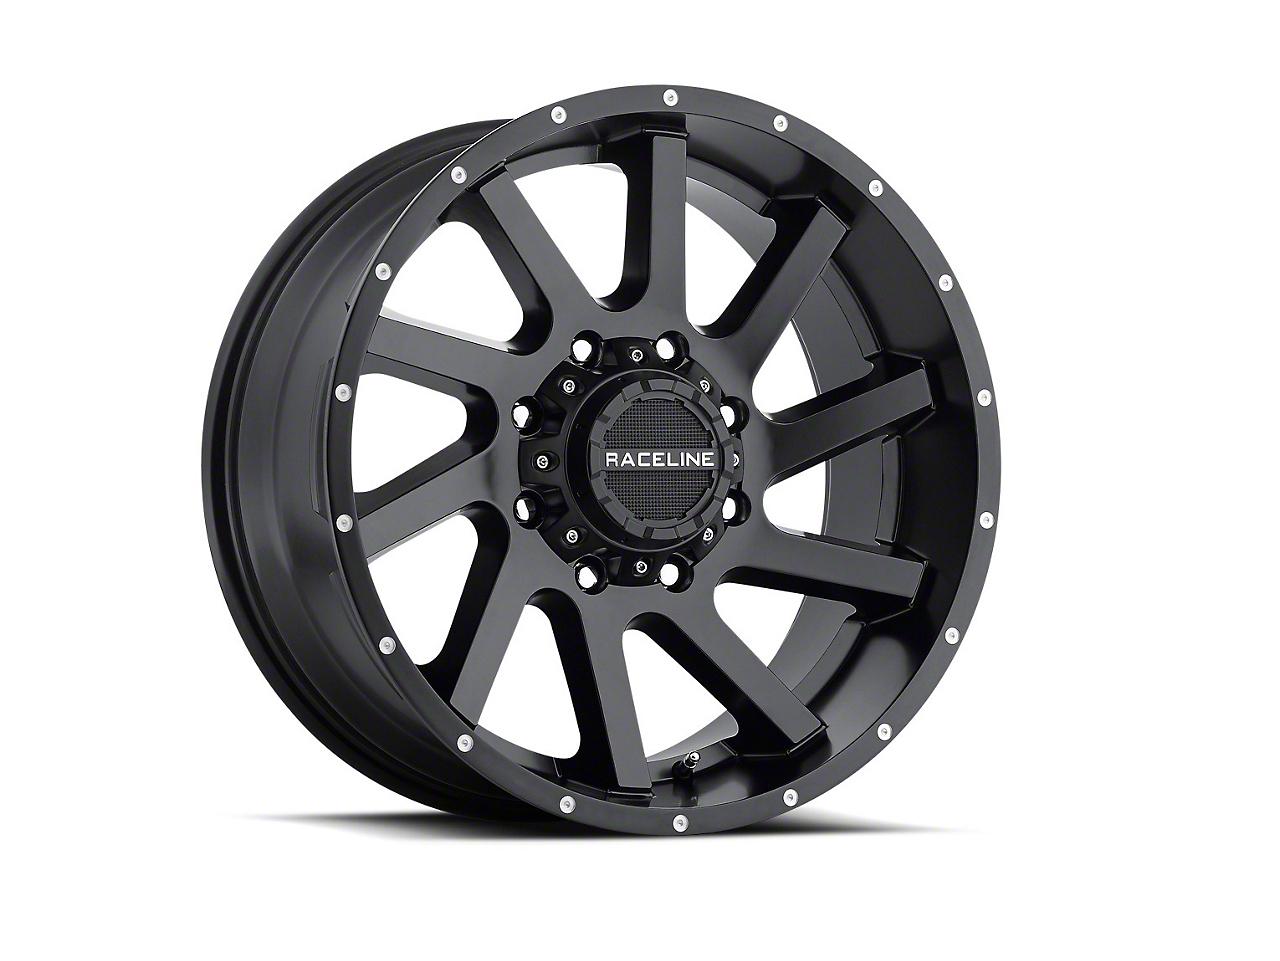 Raceline Twist Black 6-Lug Wheel - 20x12 (07-18 Sierra 1500)